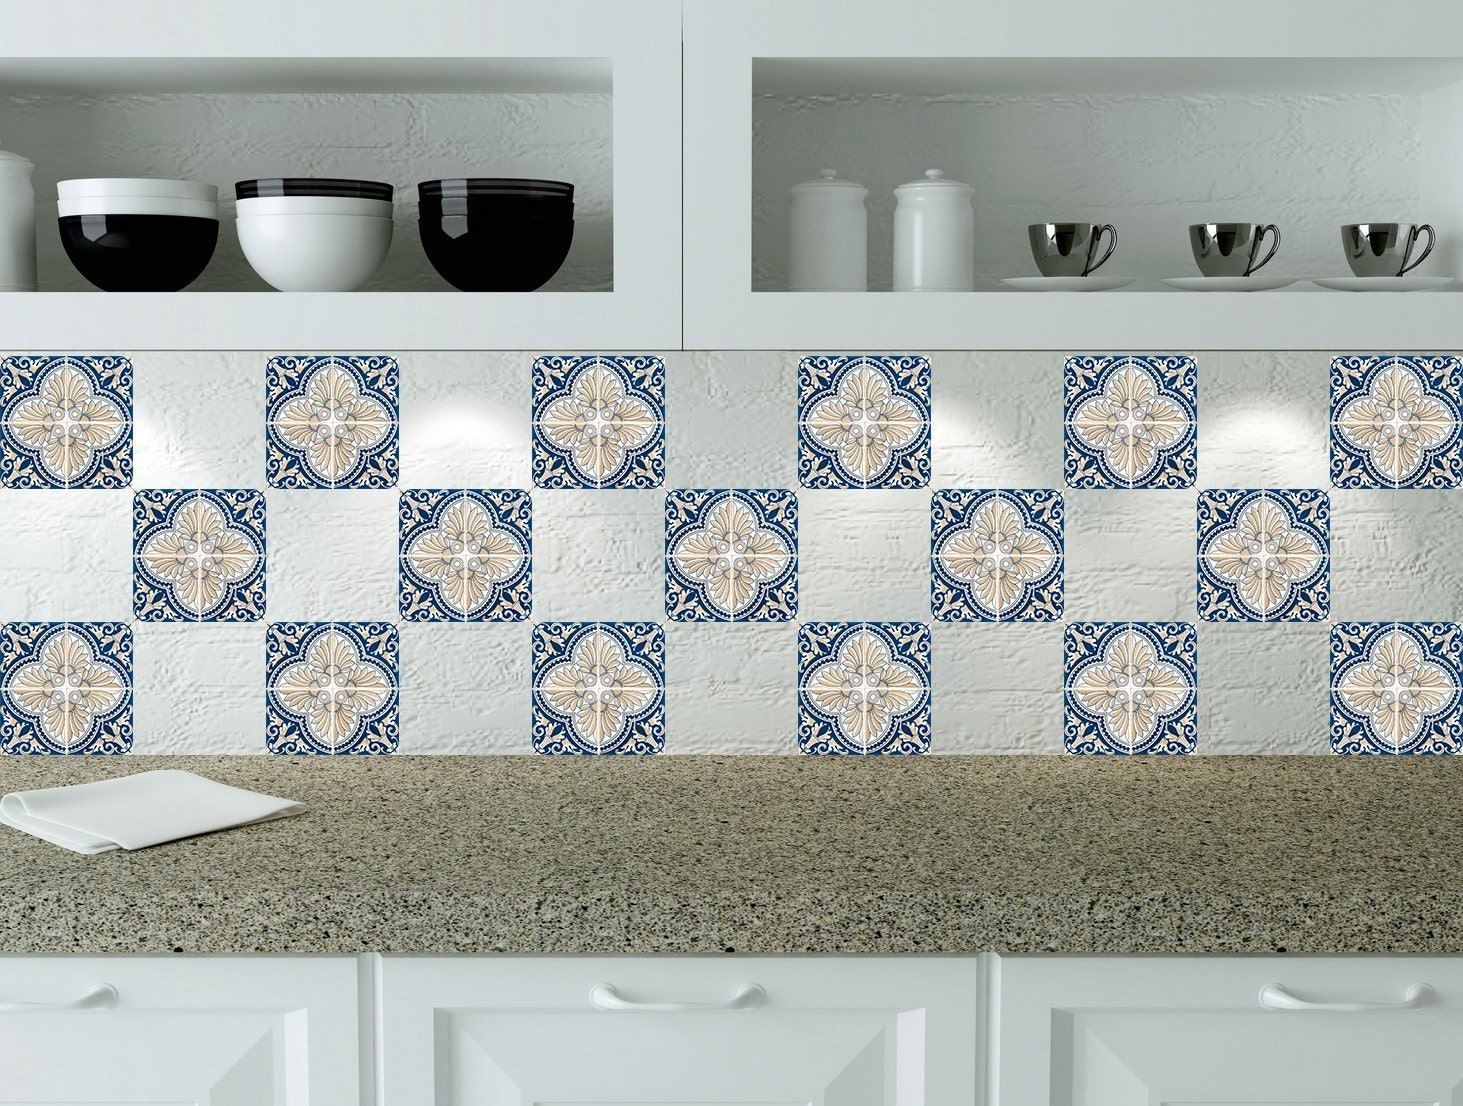 Design 24 tile stickers Mexican Talavera style Splashback